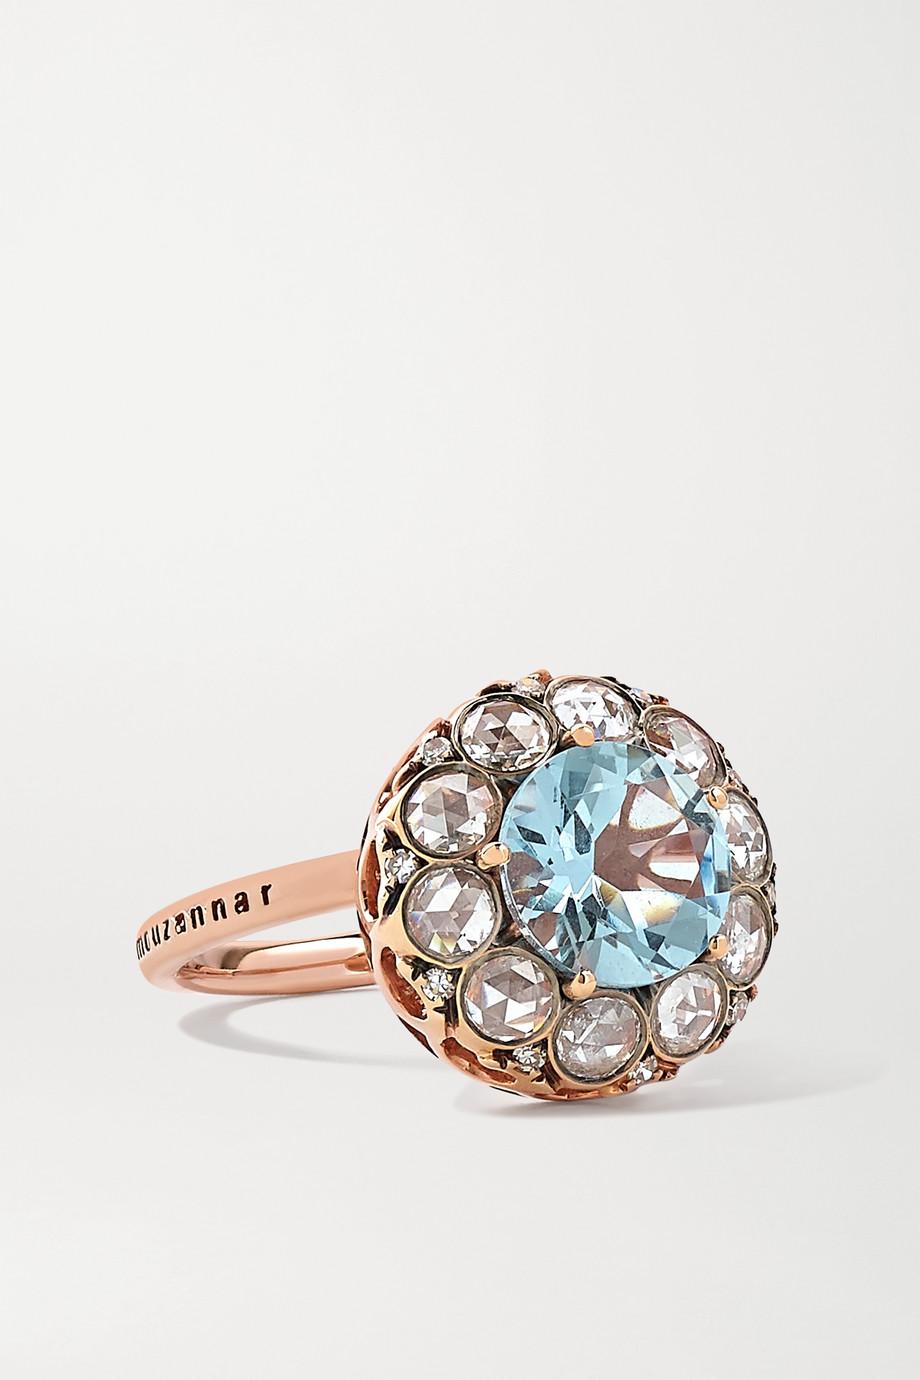 Selim Mouzannar Beirut 18-karat rose gold, aquamarine and diamond ring